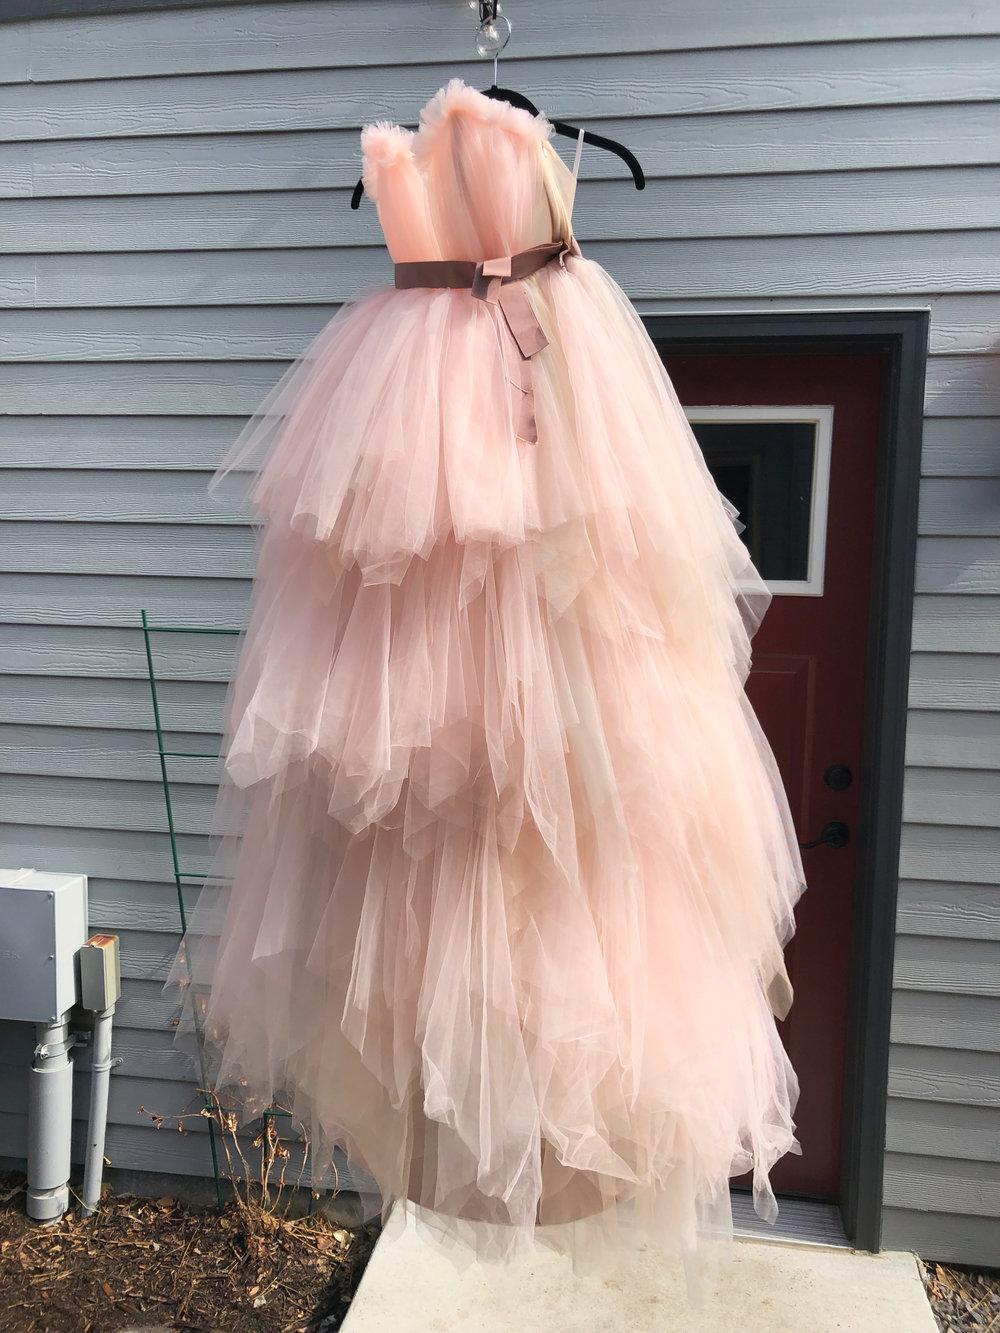 A dress to make your ballerina dreams come true